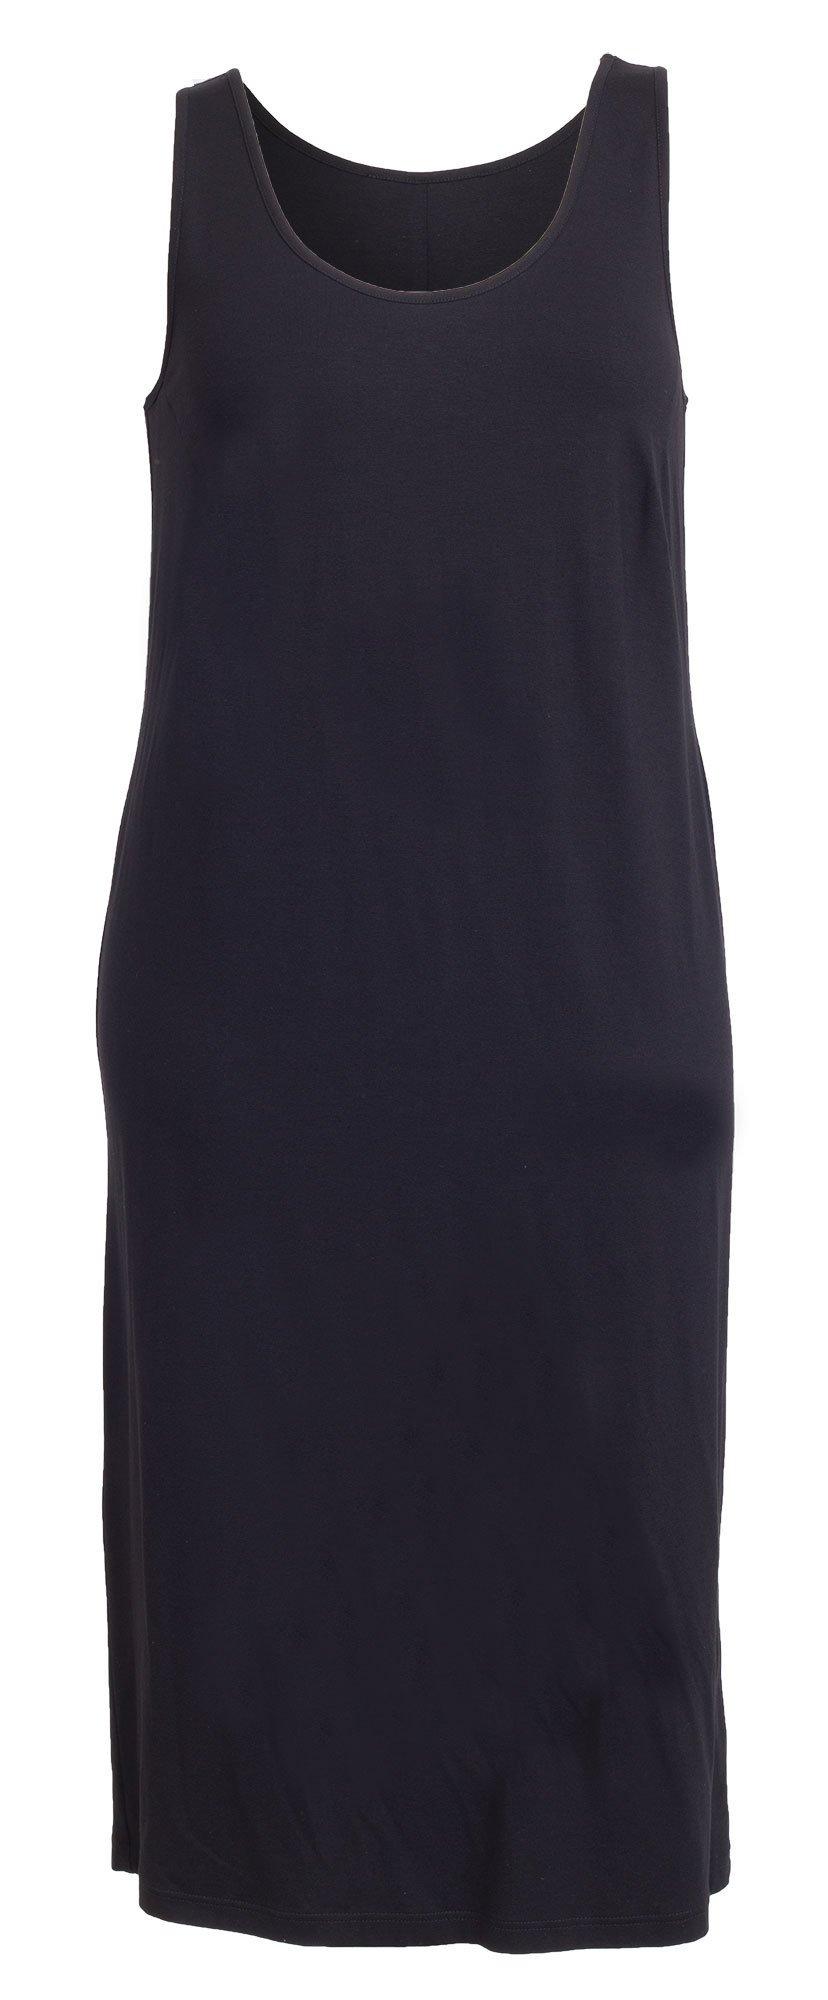 Lang sort jersey kjole i store størrelser